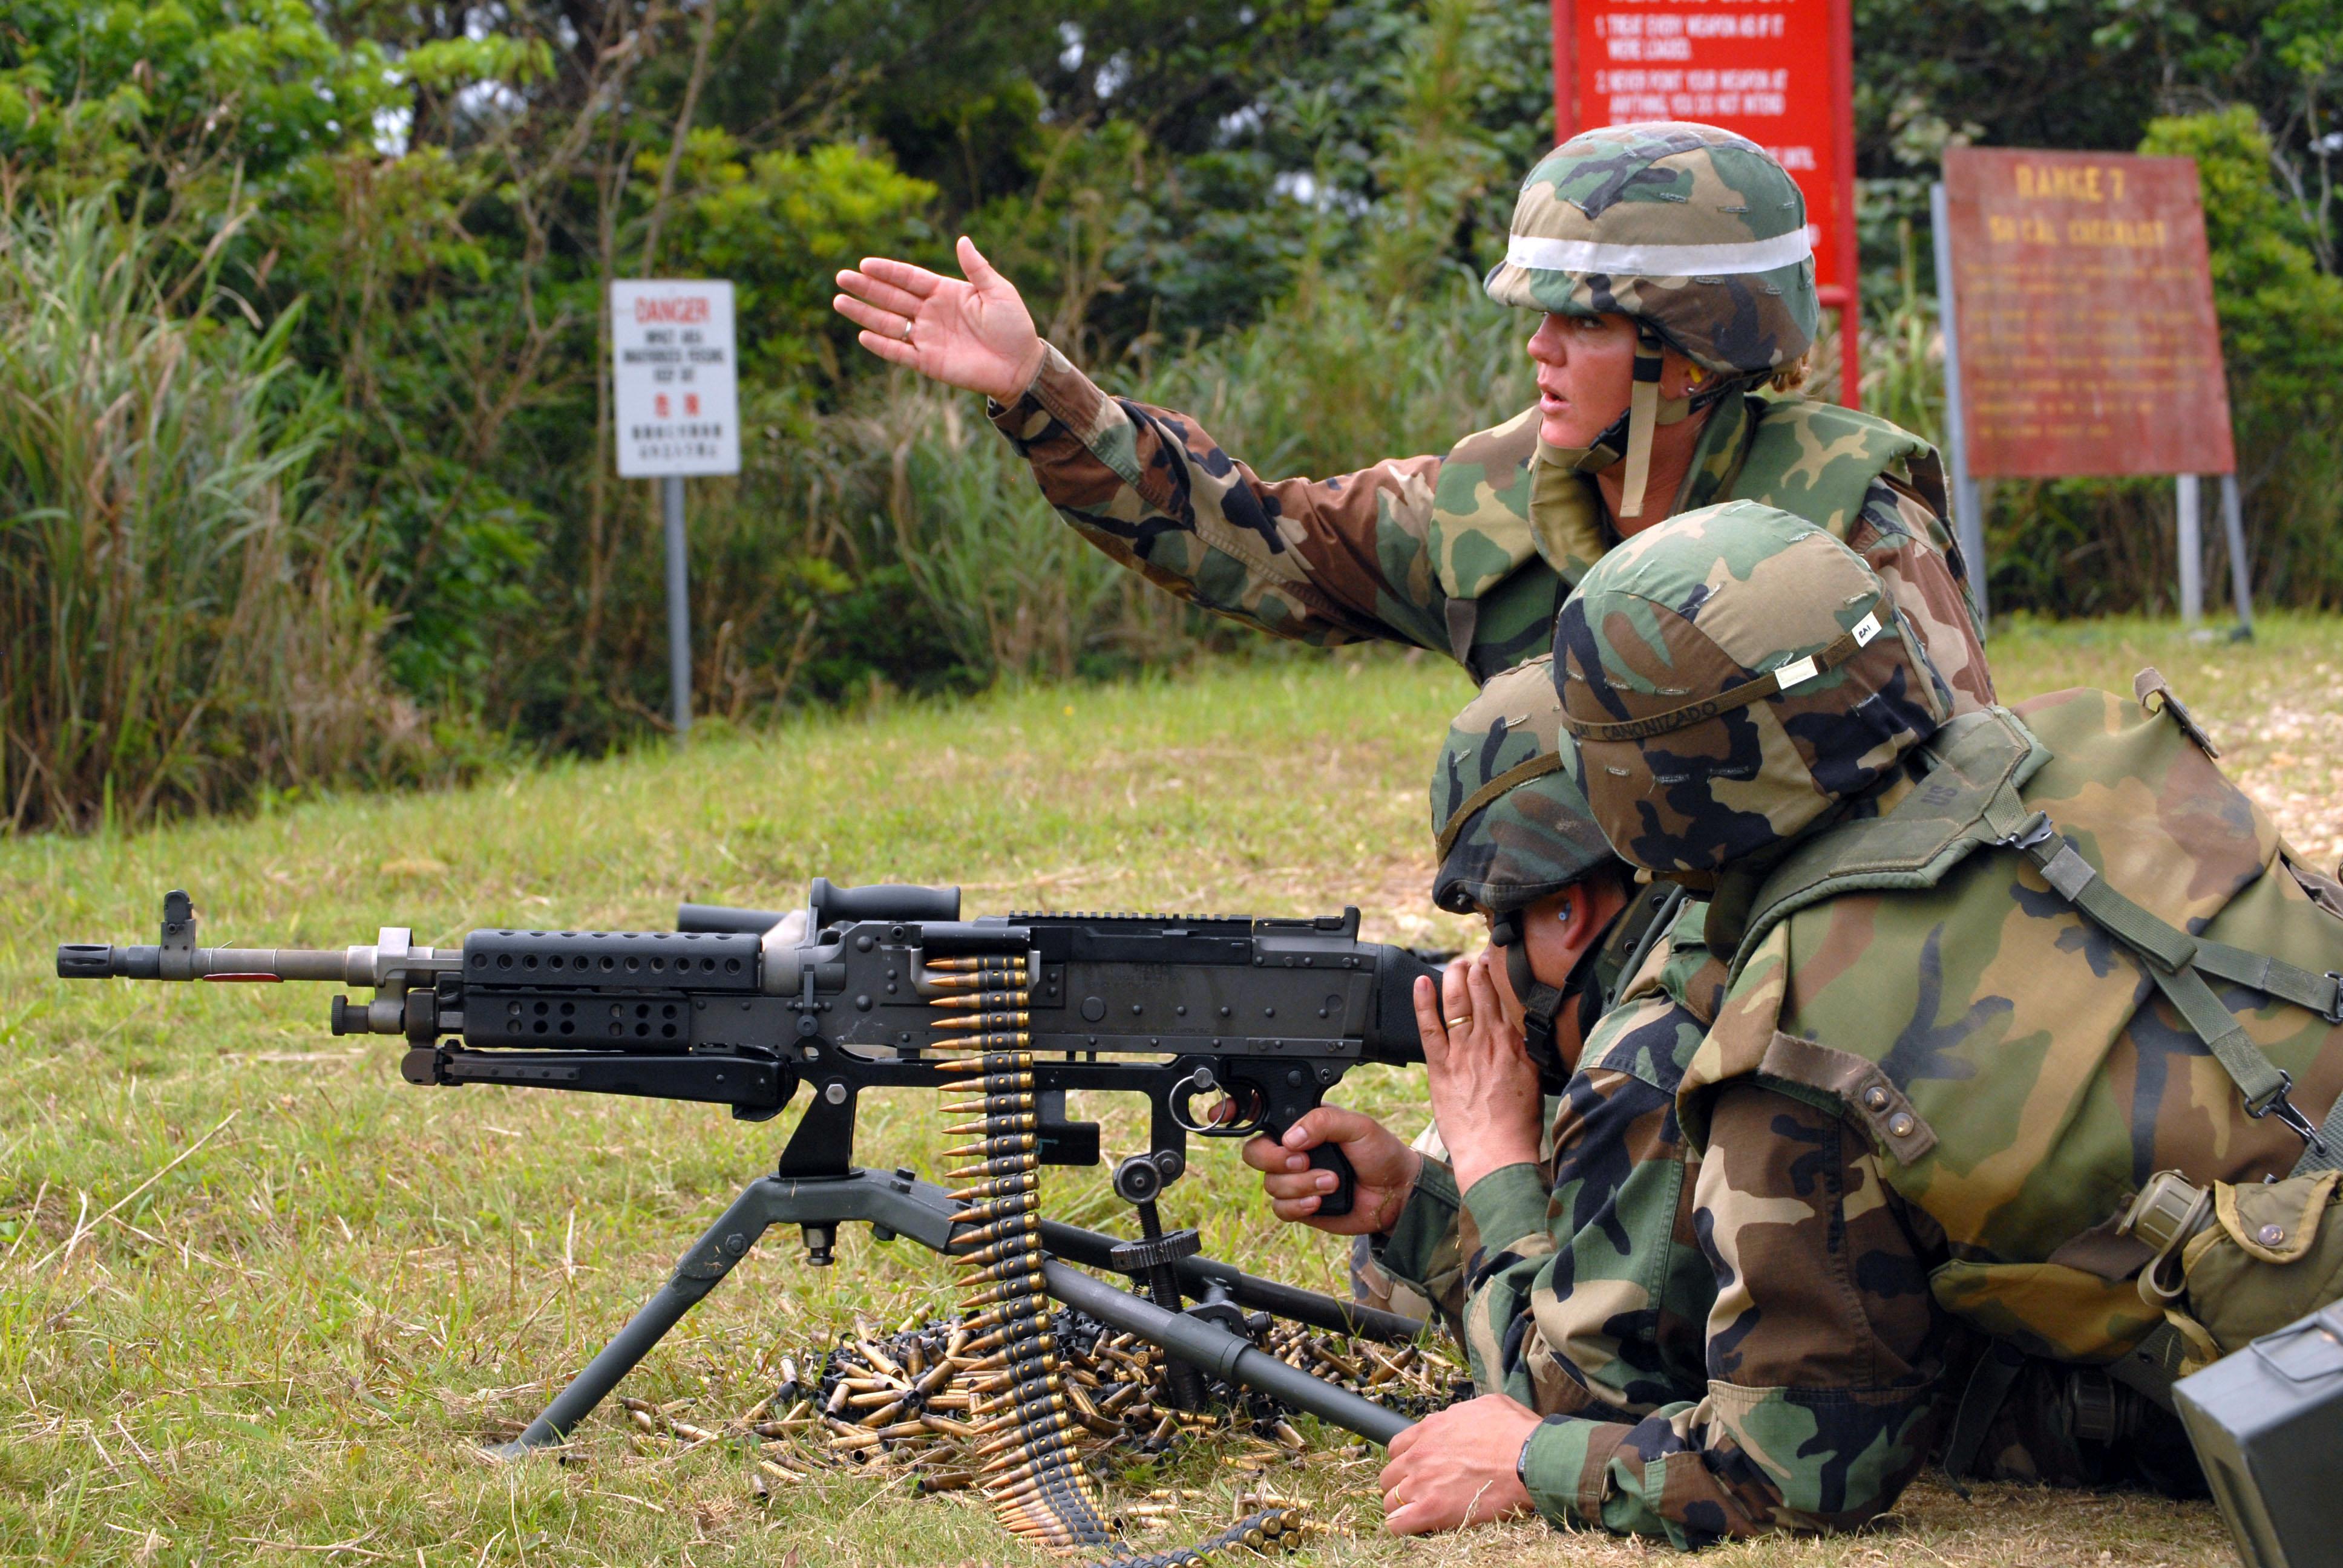 New From Shaolin Rifleworks: 1/2 MOA AR-10 & AR-15 Rifles